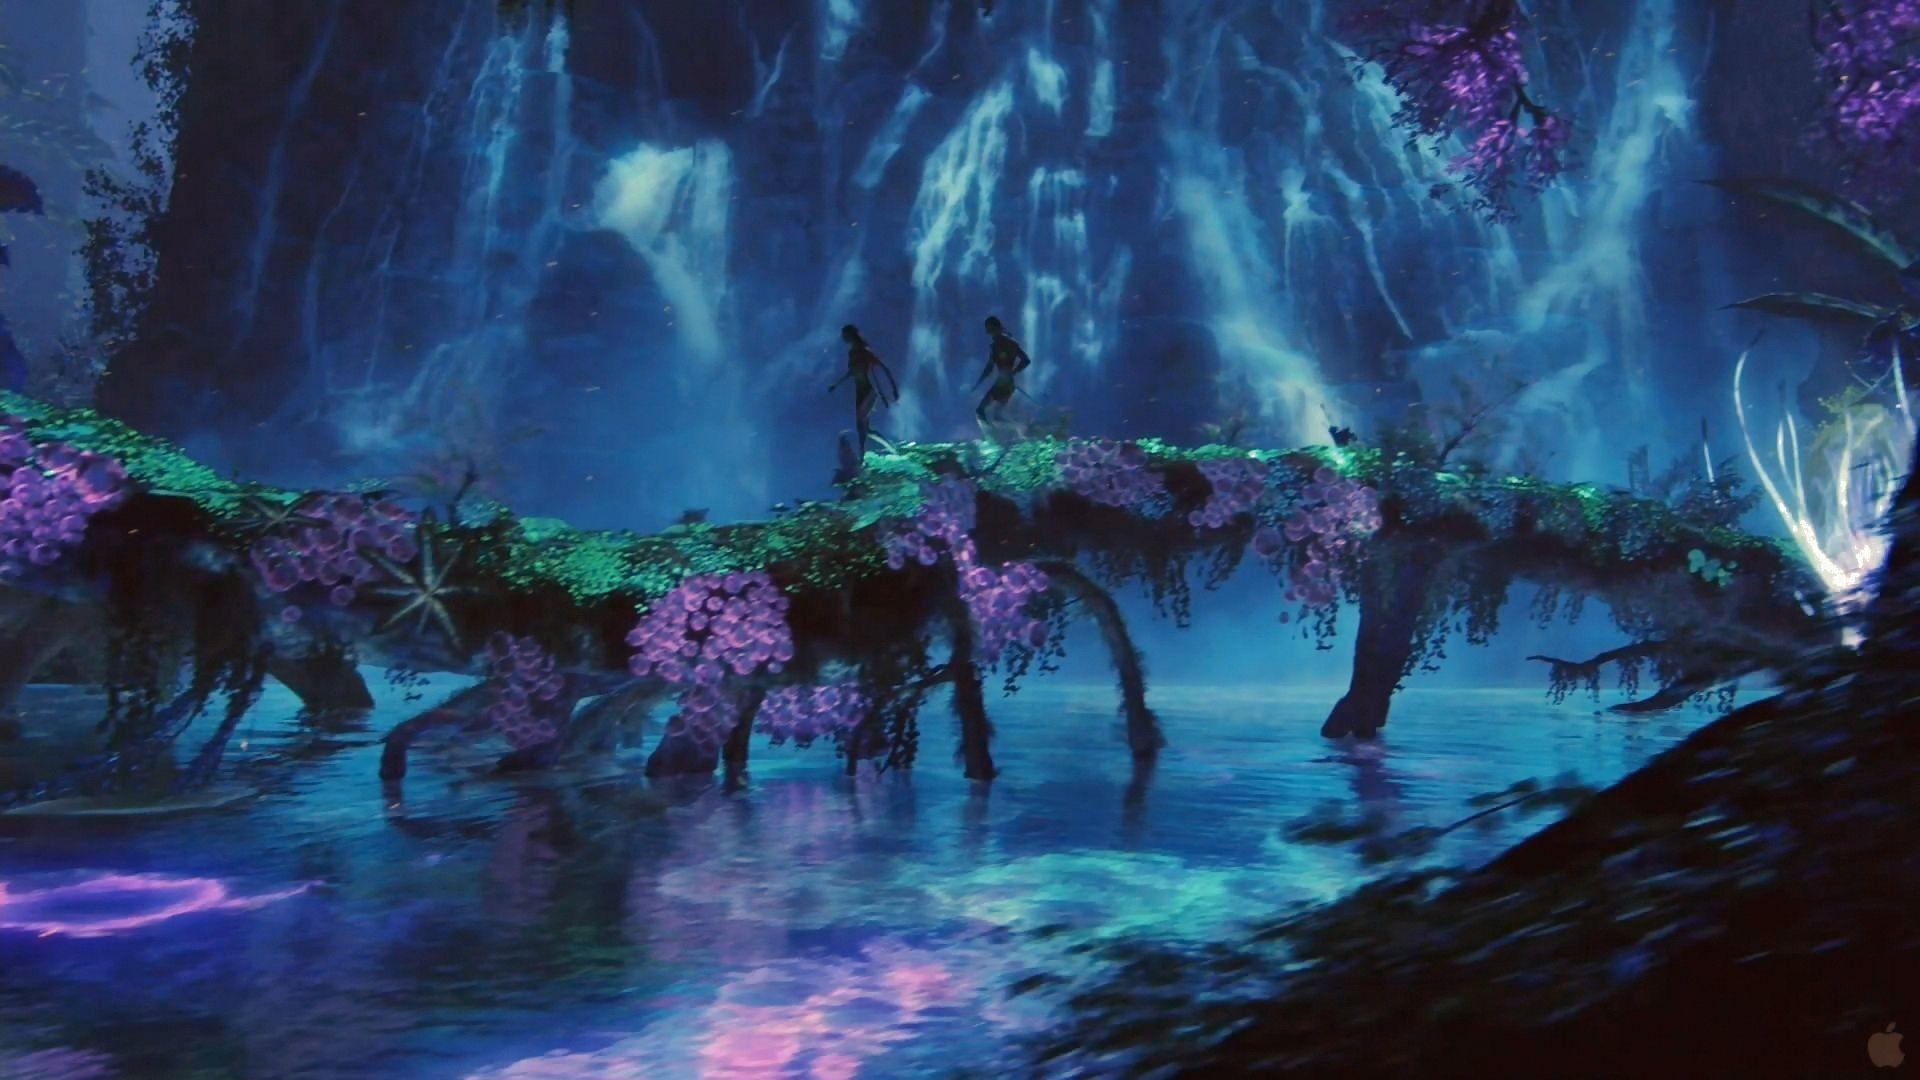 Bioluminescence Avatar, James cameron and Movie